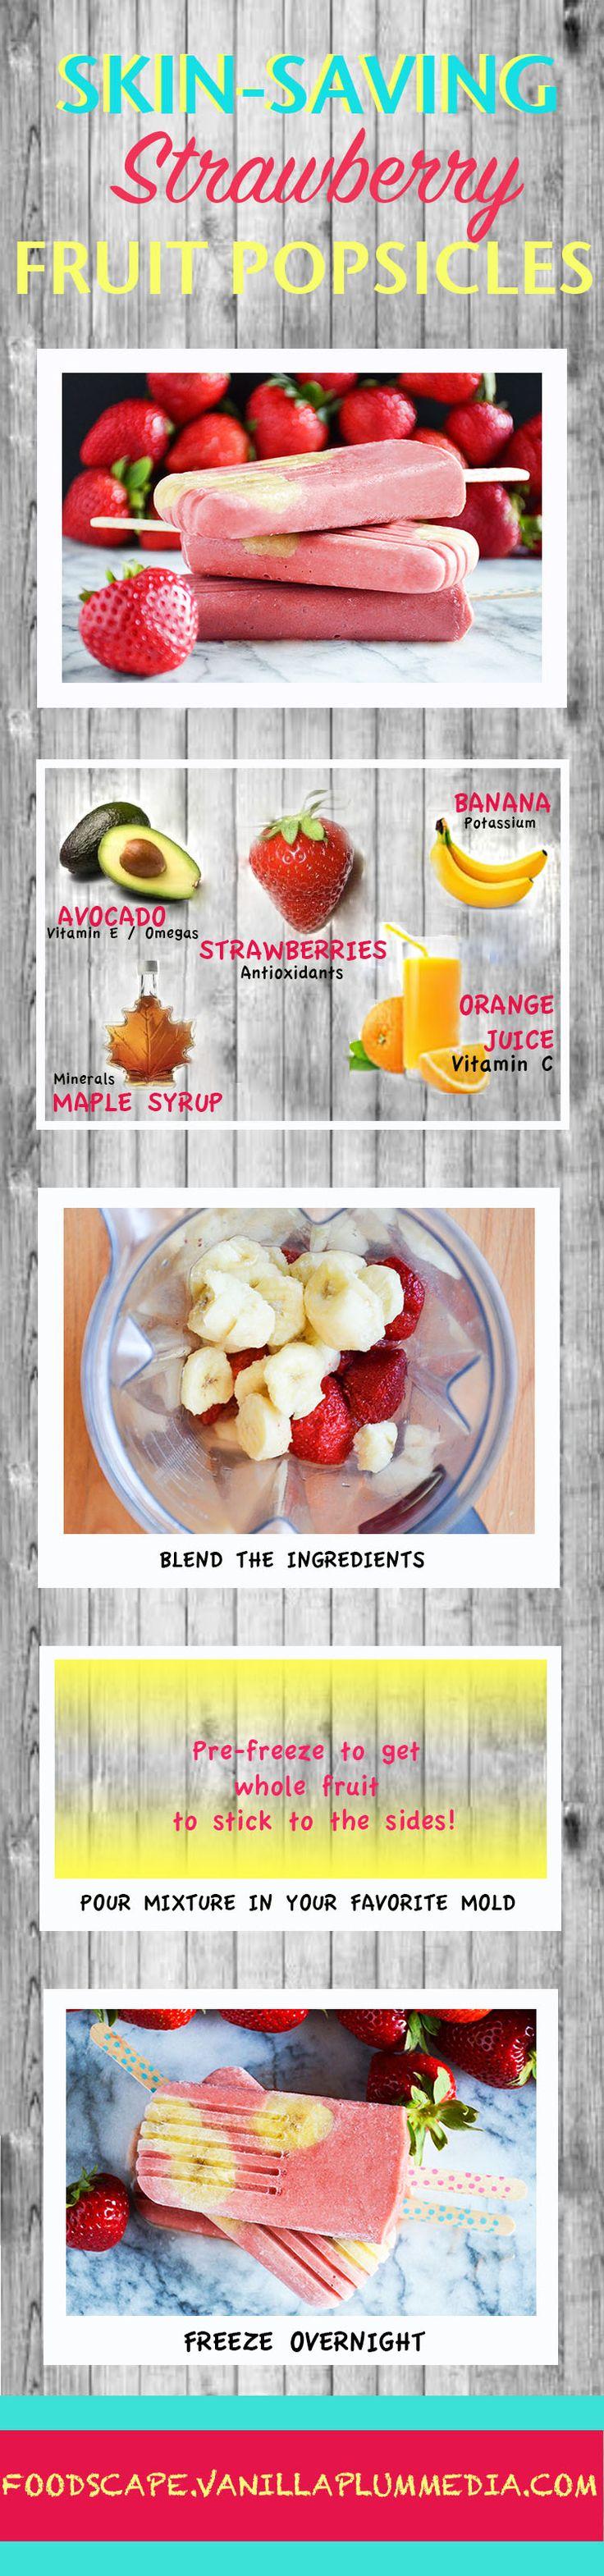 Easy frozen fruit bar for healthy skin. Bonus: The kids will love it! Healthy breakfast or snack.  - Skin-Saving Strawberry Fruit Popsicle | http://foodscape.vanillaplummedia.com/